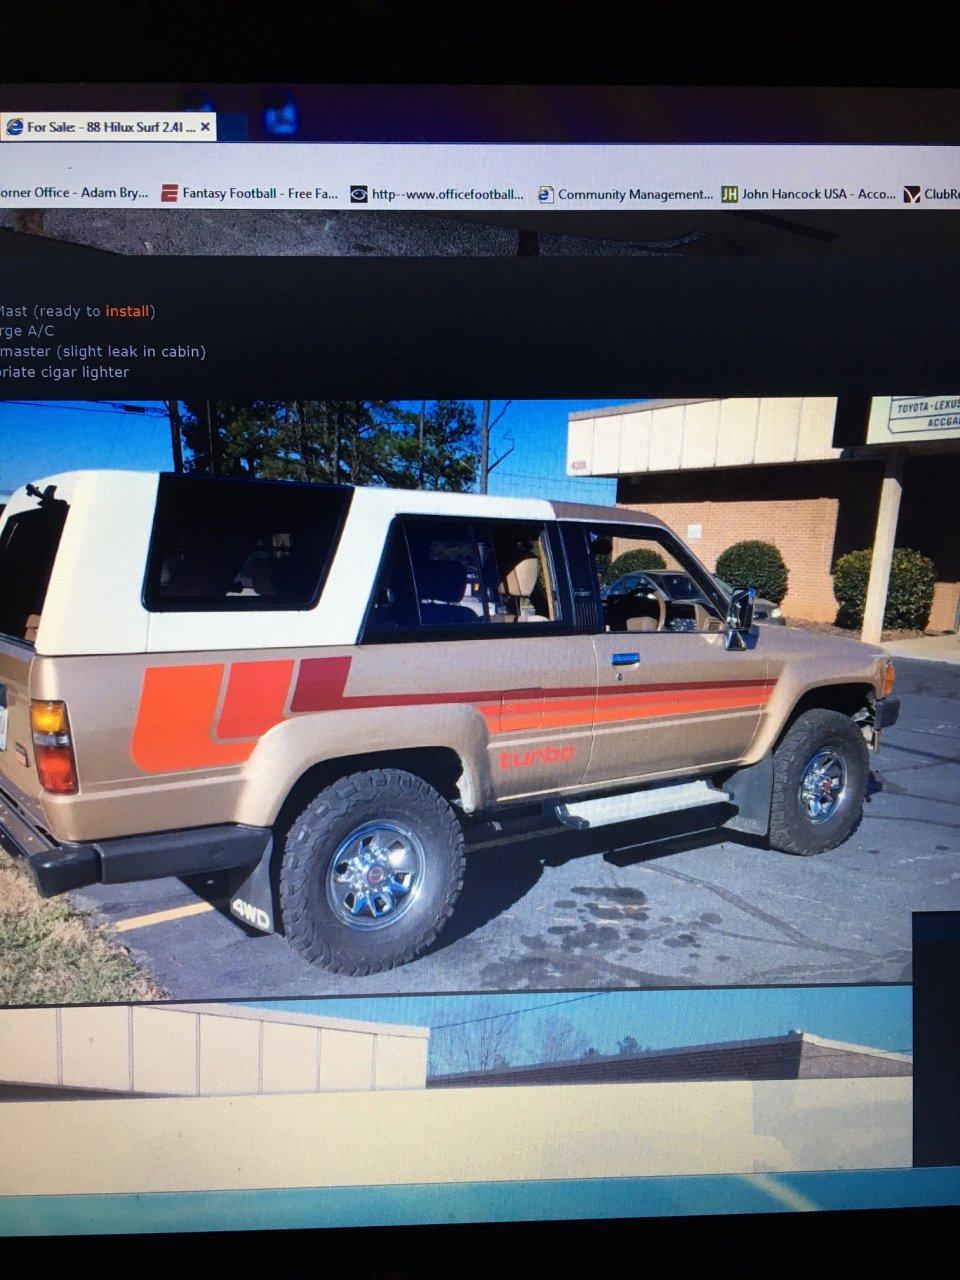 For Sale - 1988 Toyota Hilux Surf Import $15,500 | IH8MUD Forum